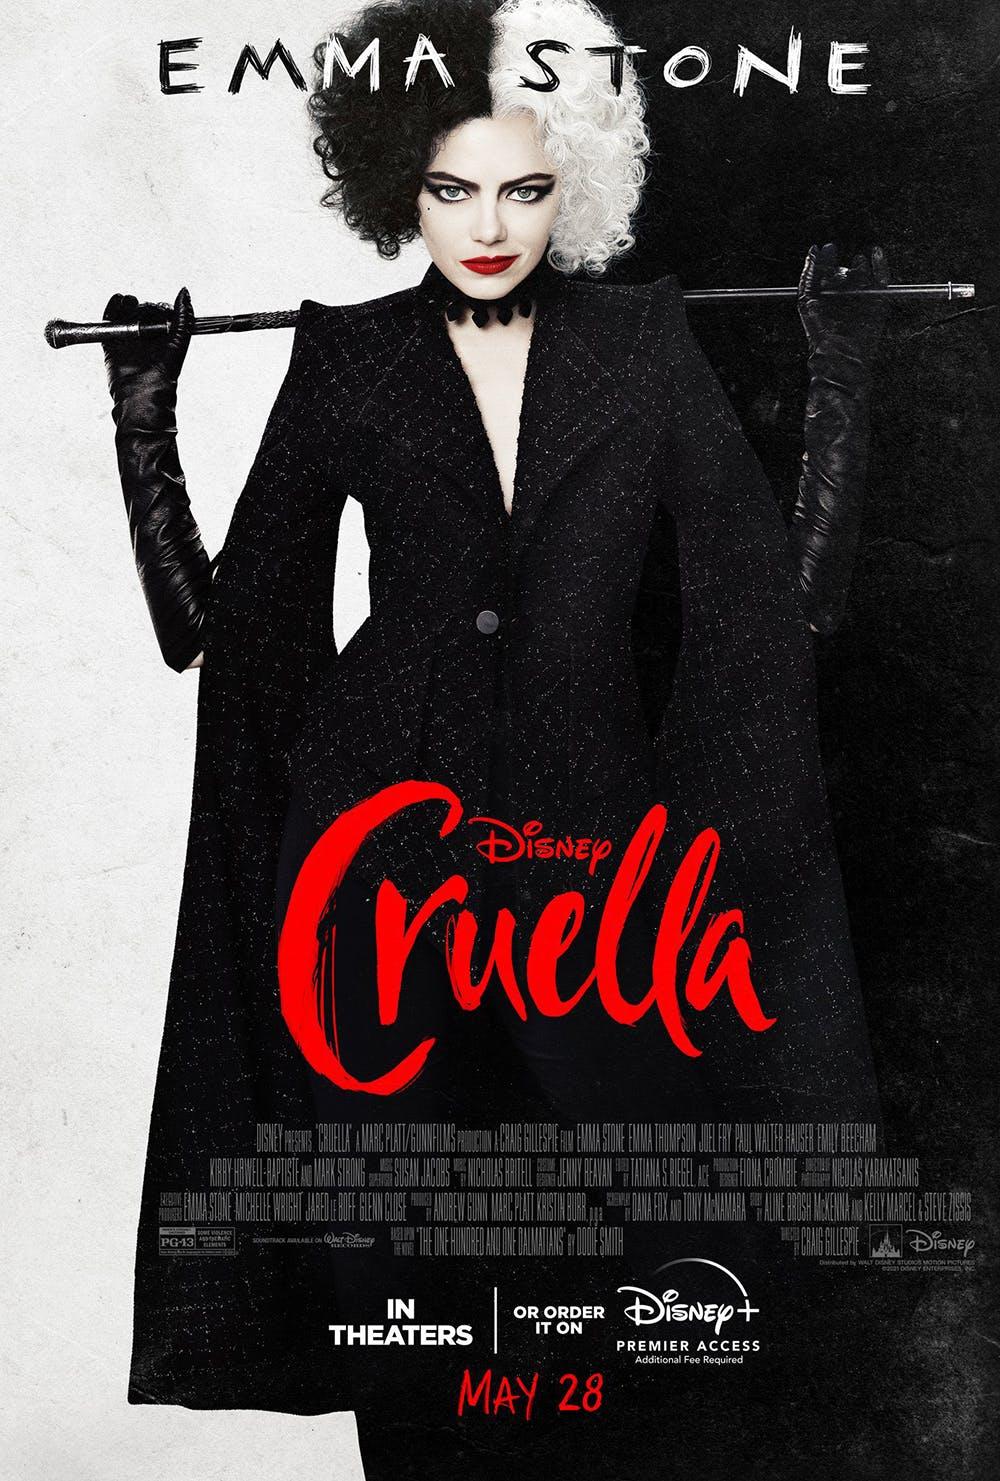 Cruella nouvelle affiche Disney